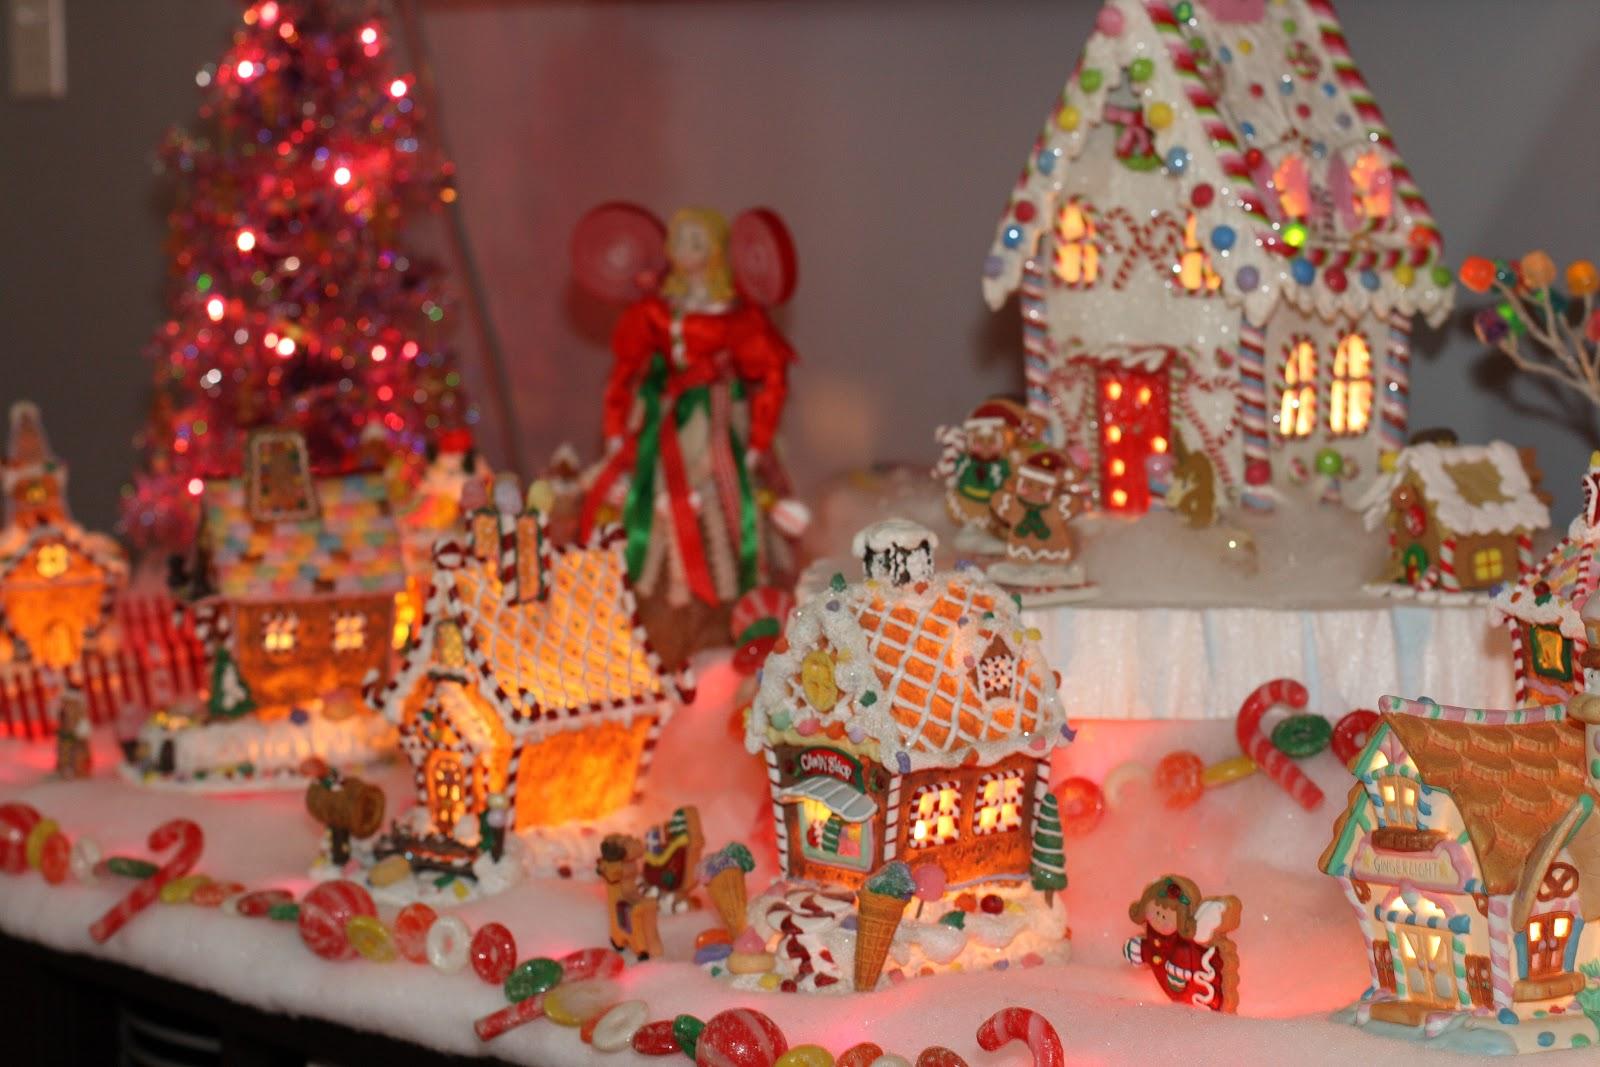 Copeland Christmas Blog: Making Faux Gumdrops for the Mini ...